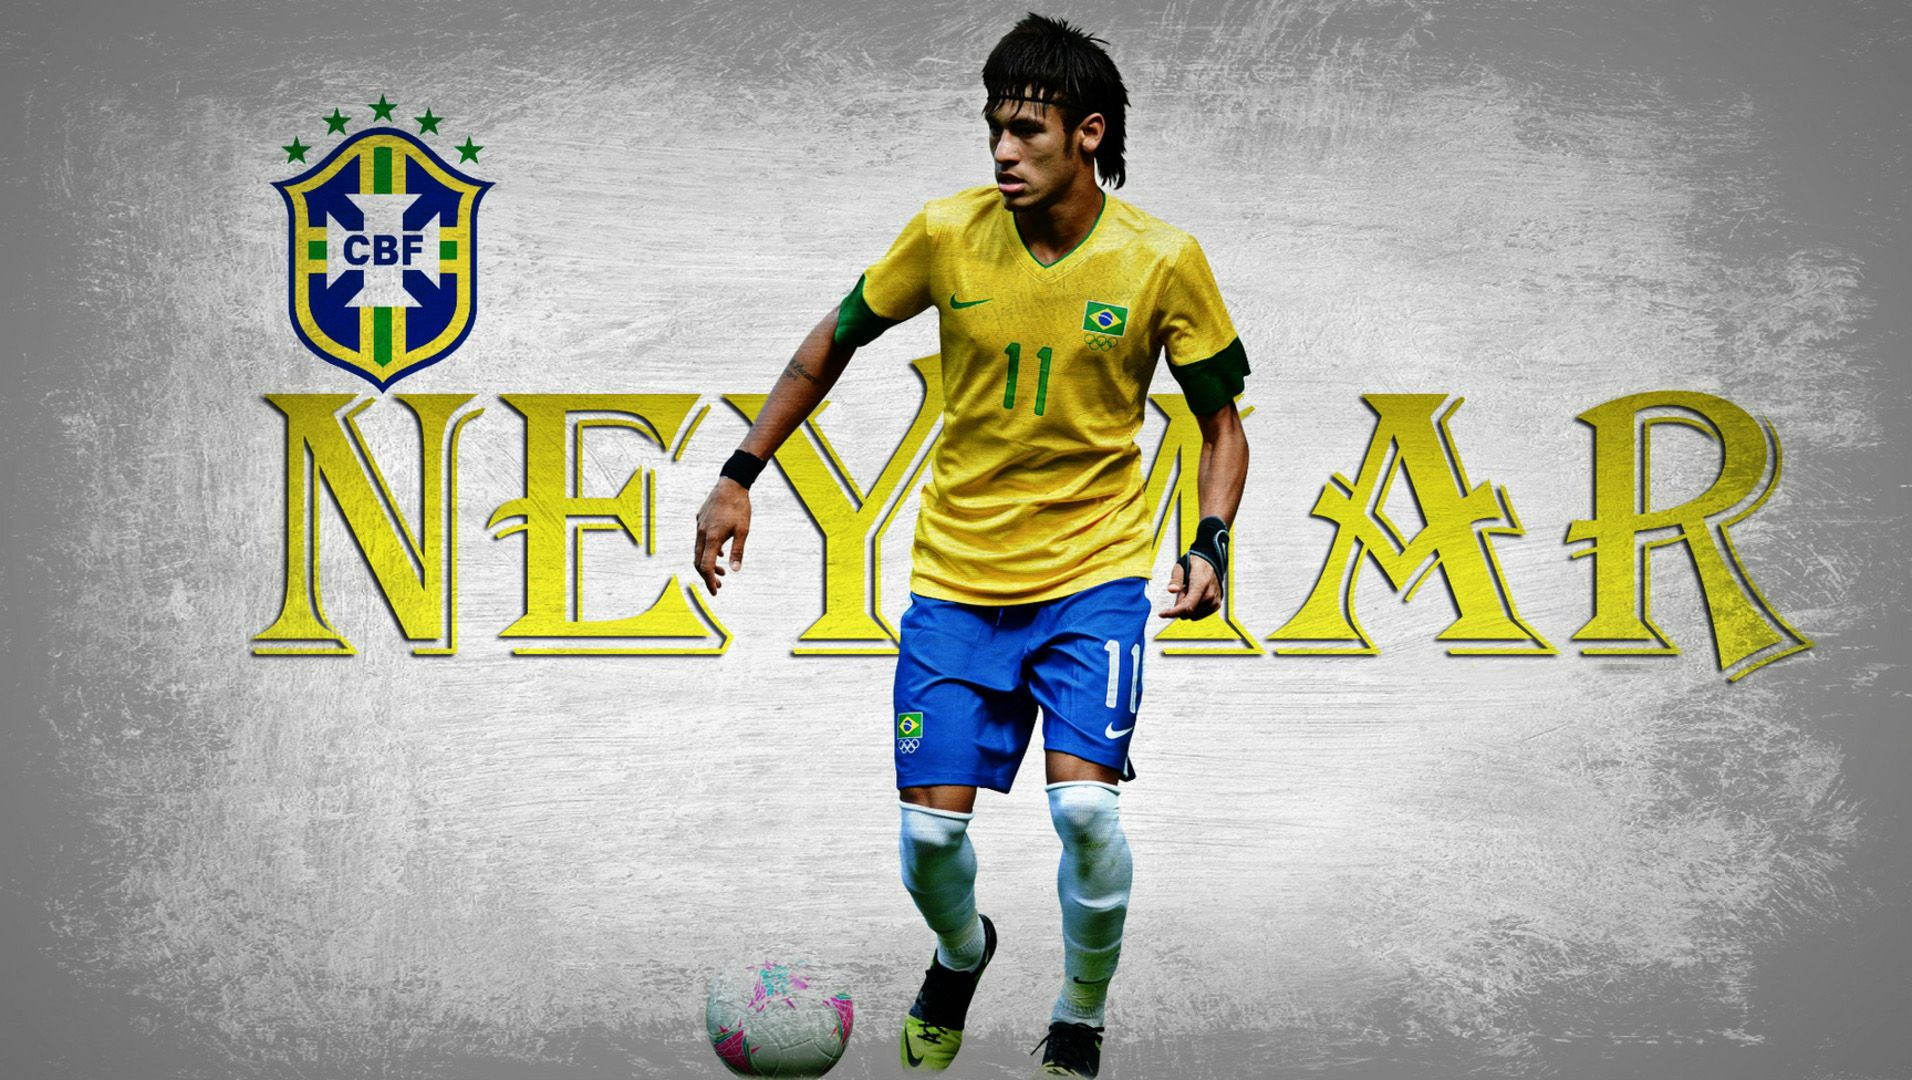 Google themes messi - Neymar